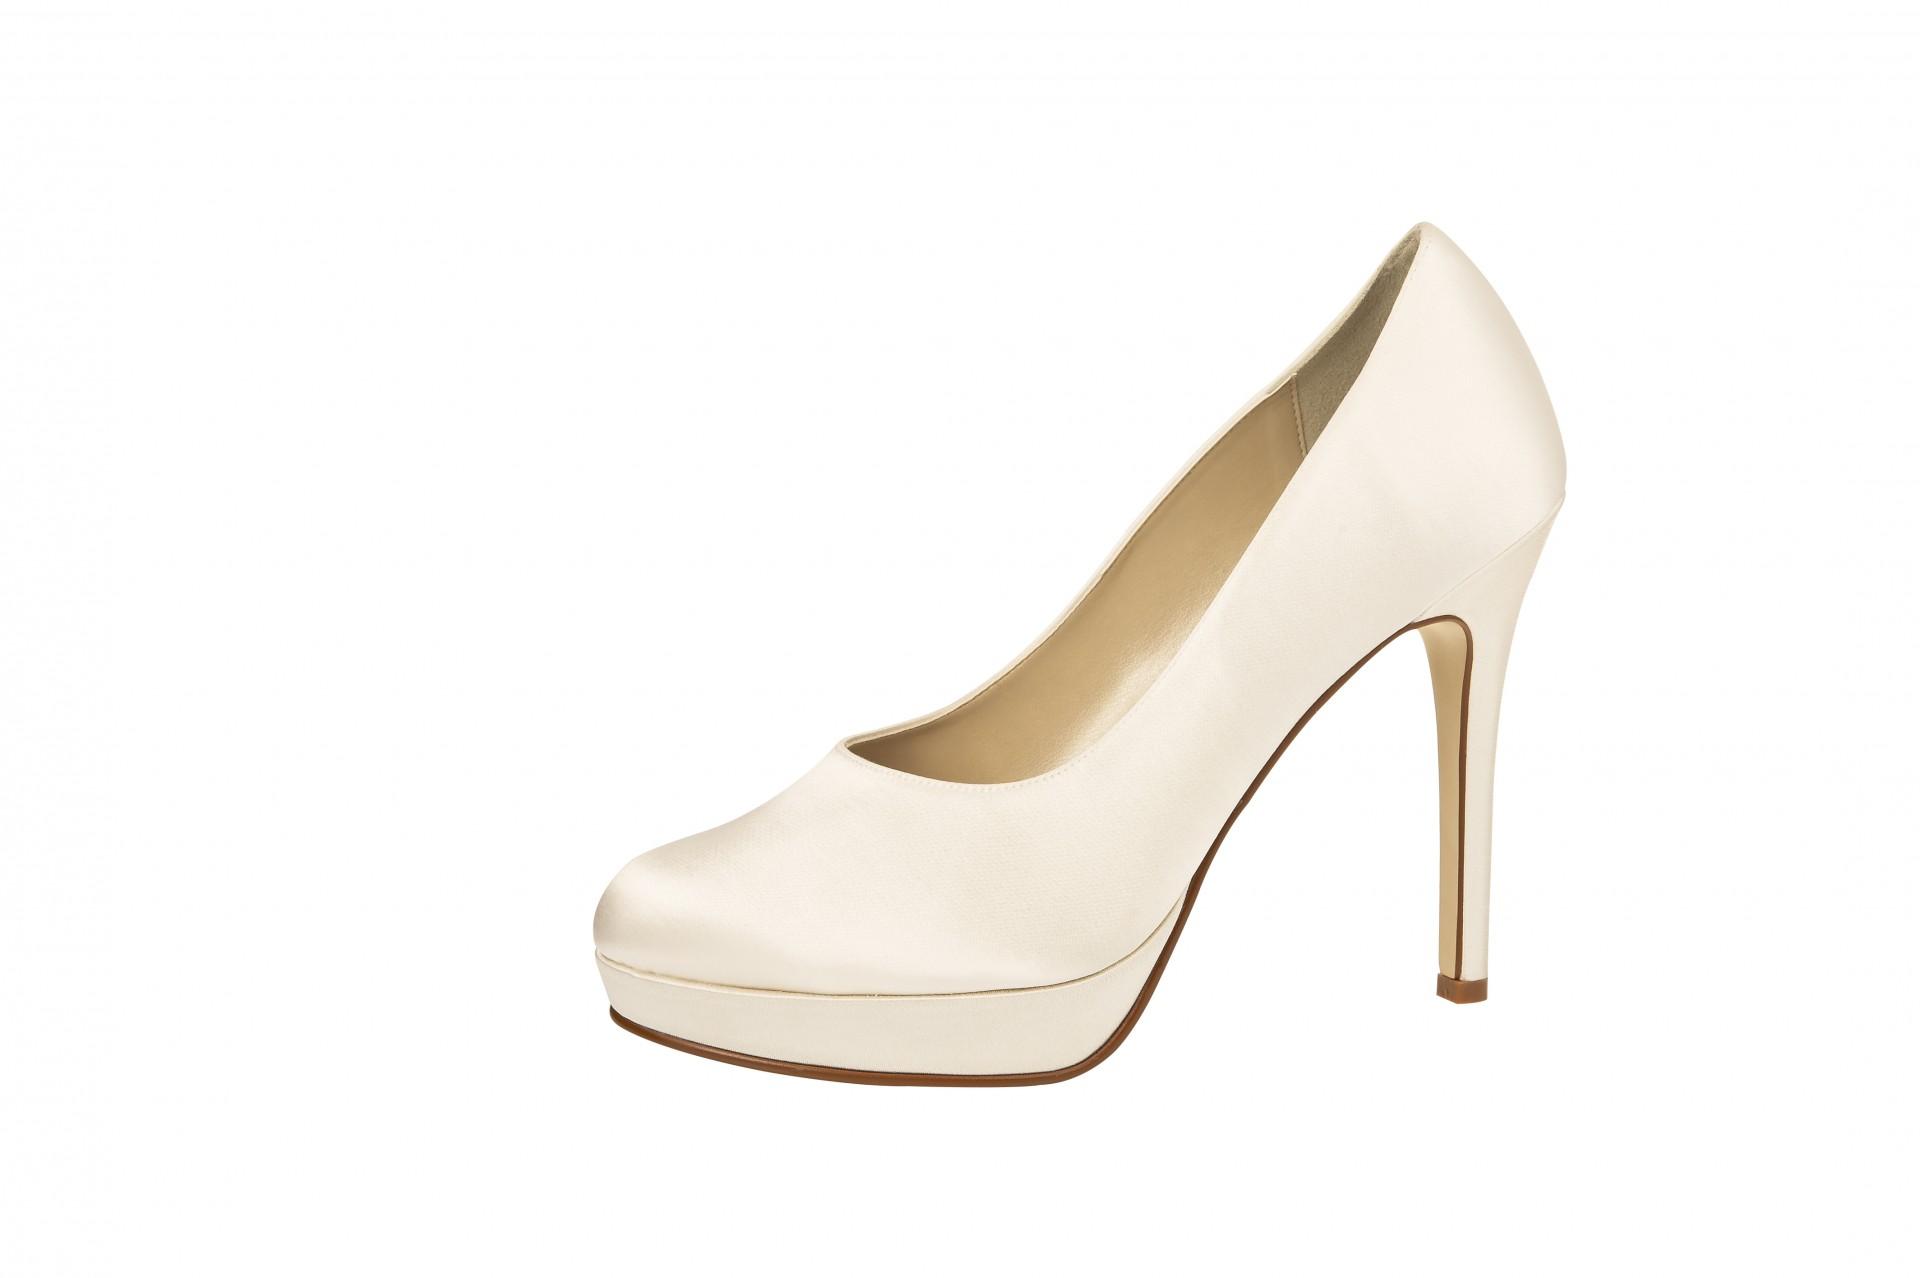 Elsa Coloured Shoes: Cindy